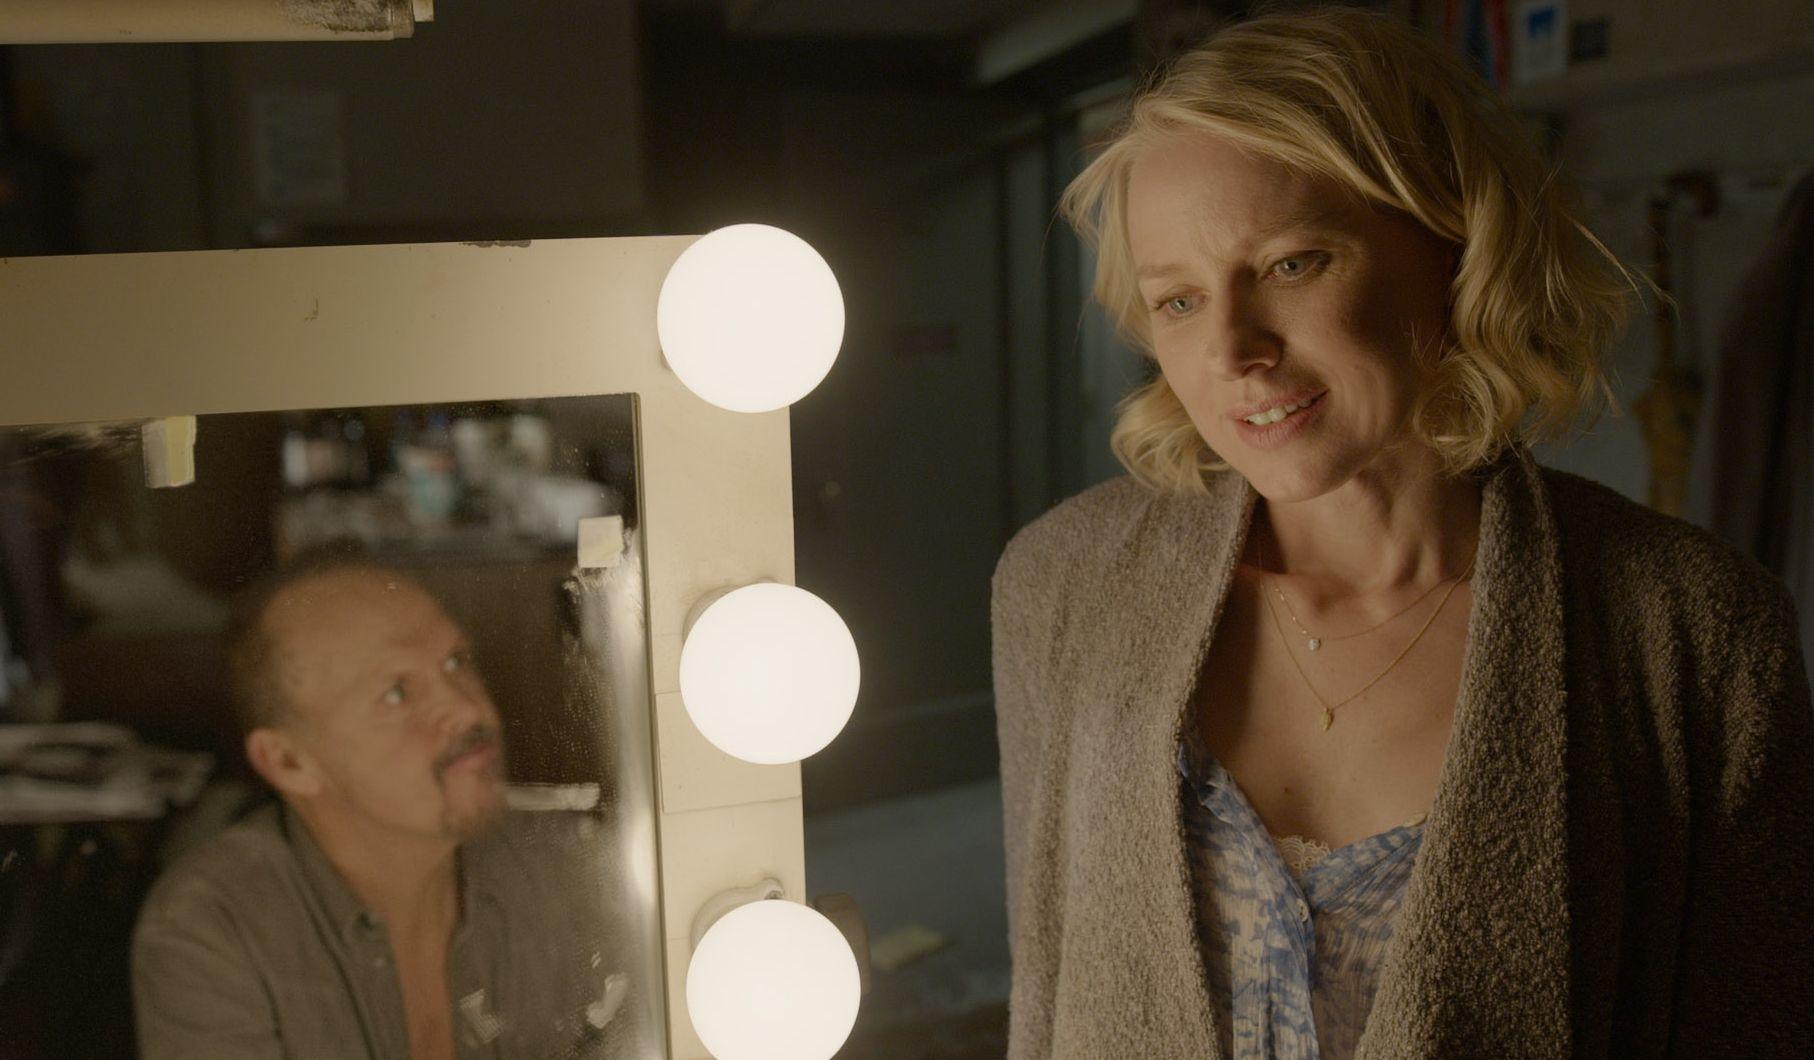 Michael Keaton and Naomi Watts backstage - Birdman